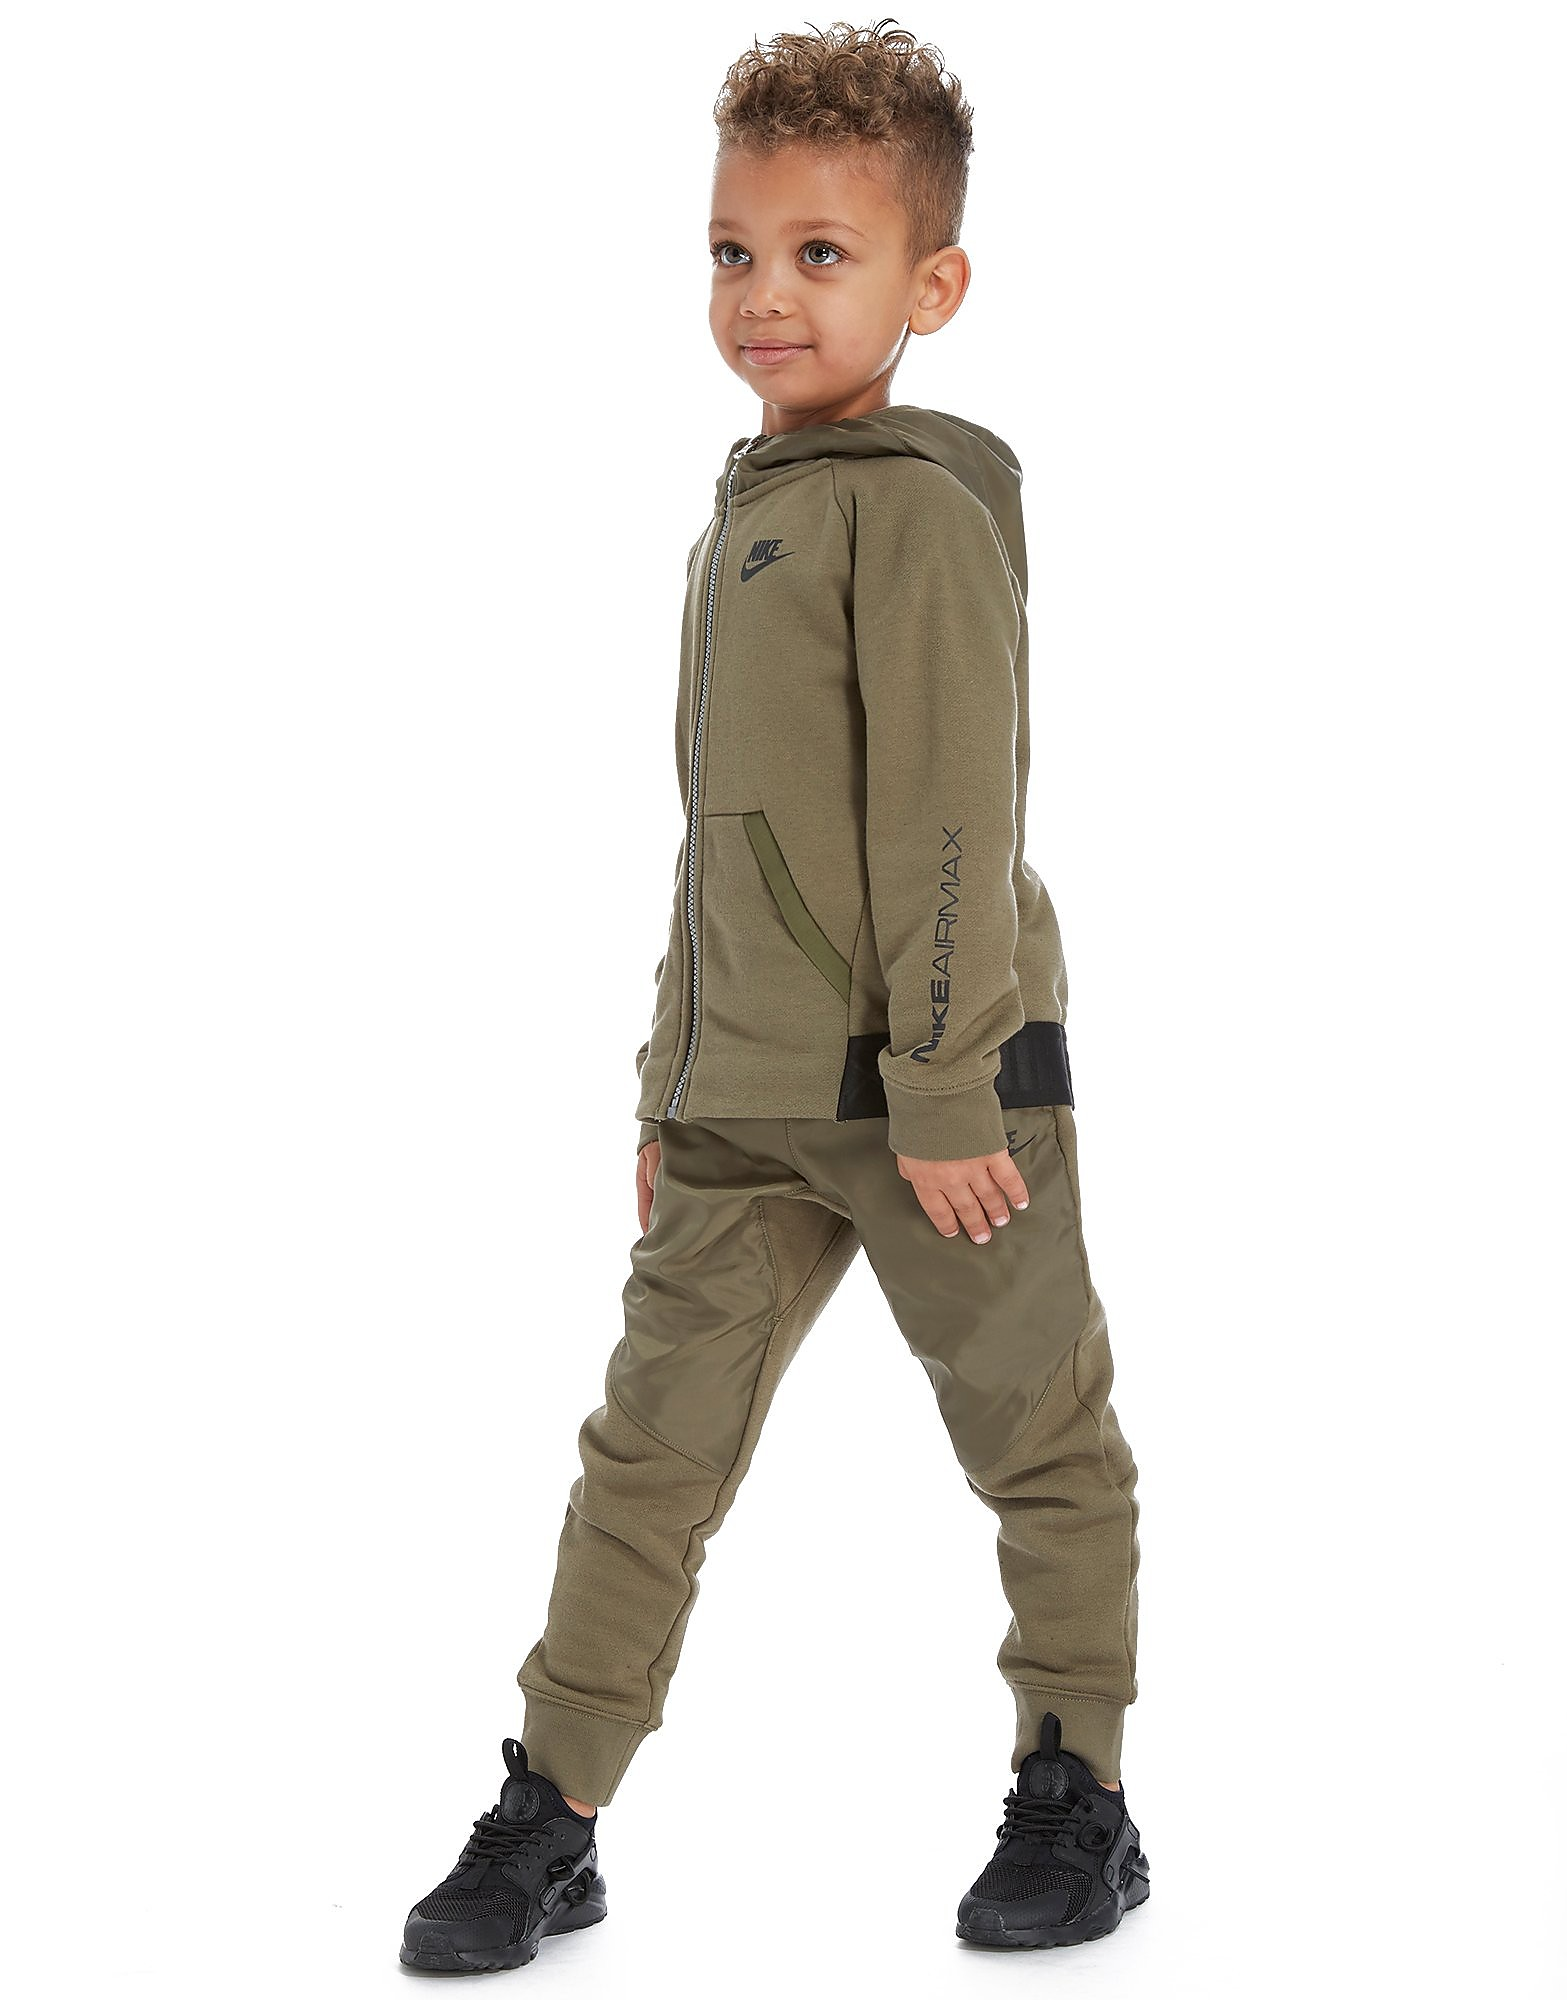 Nike Air Max Fleece Voller Reißverschluss Anzug Kleinkind